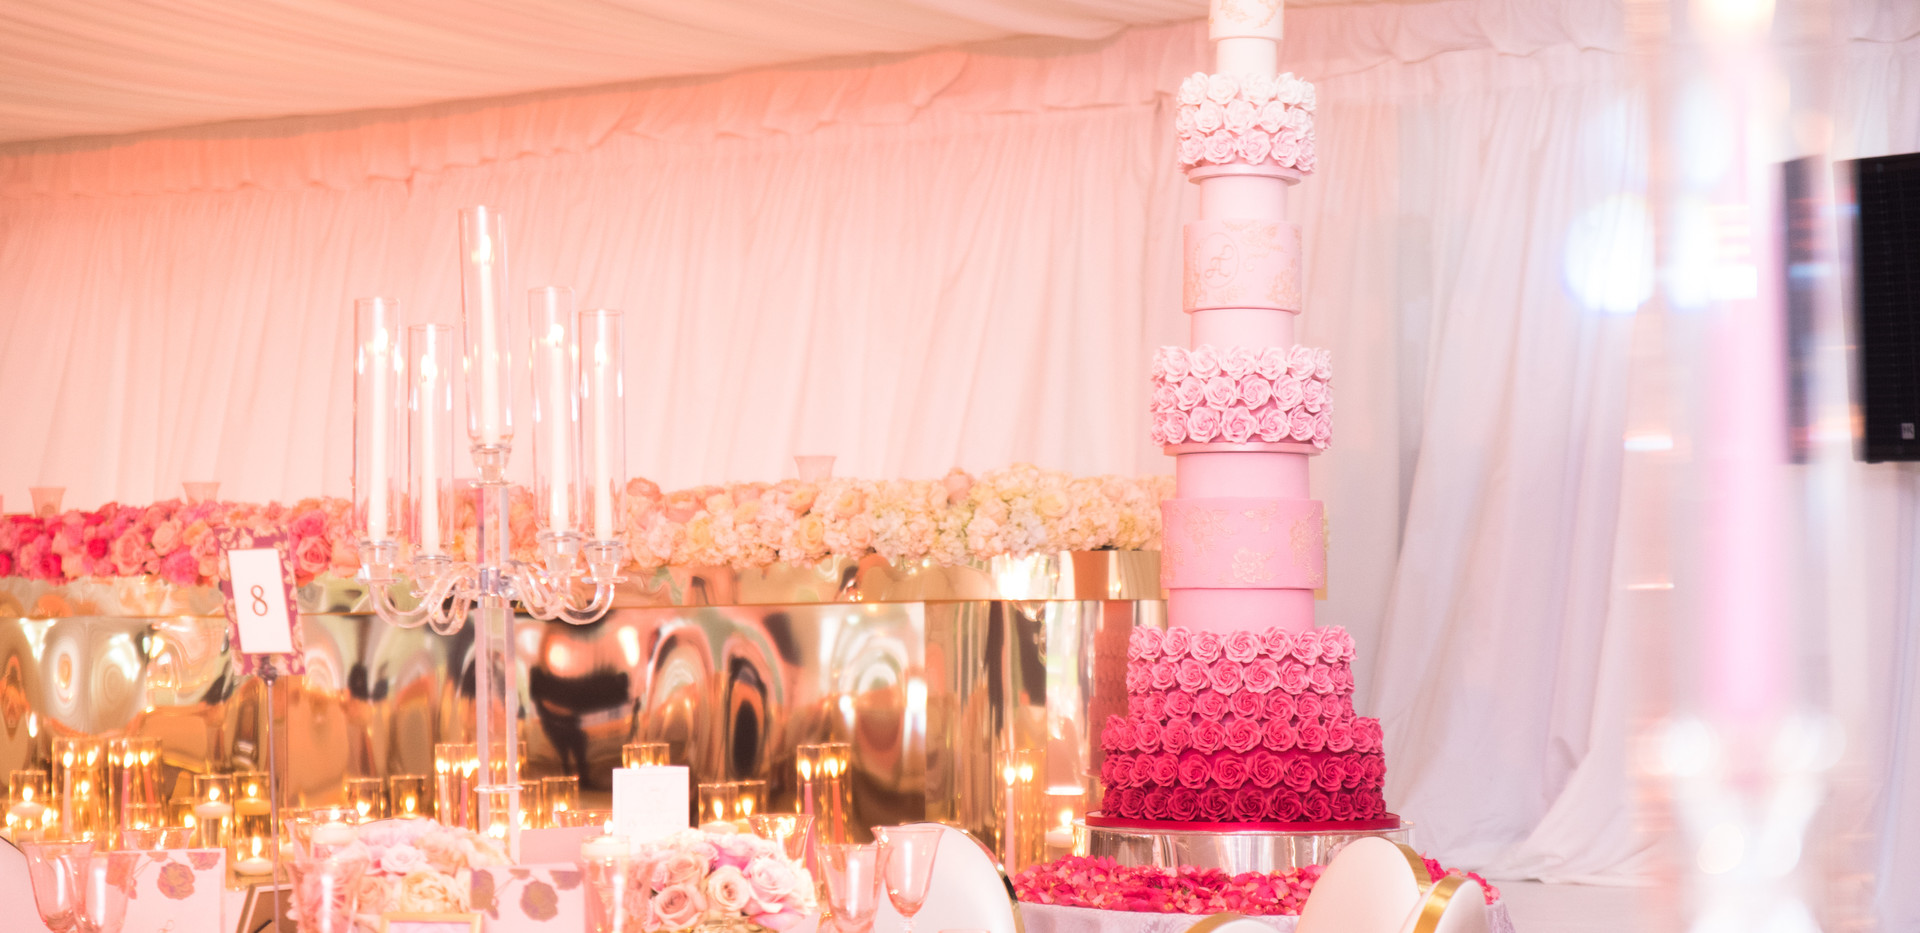 Boreham House Wedding Cake